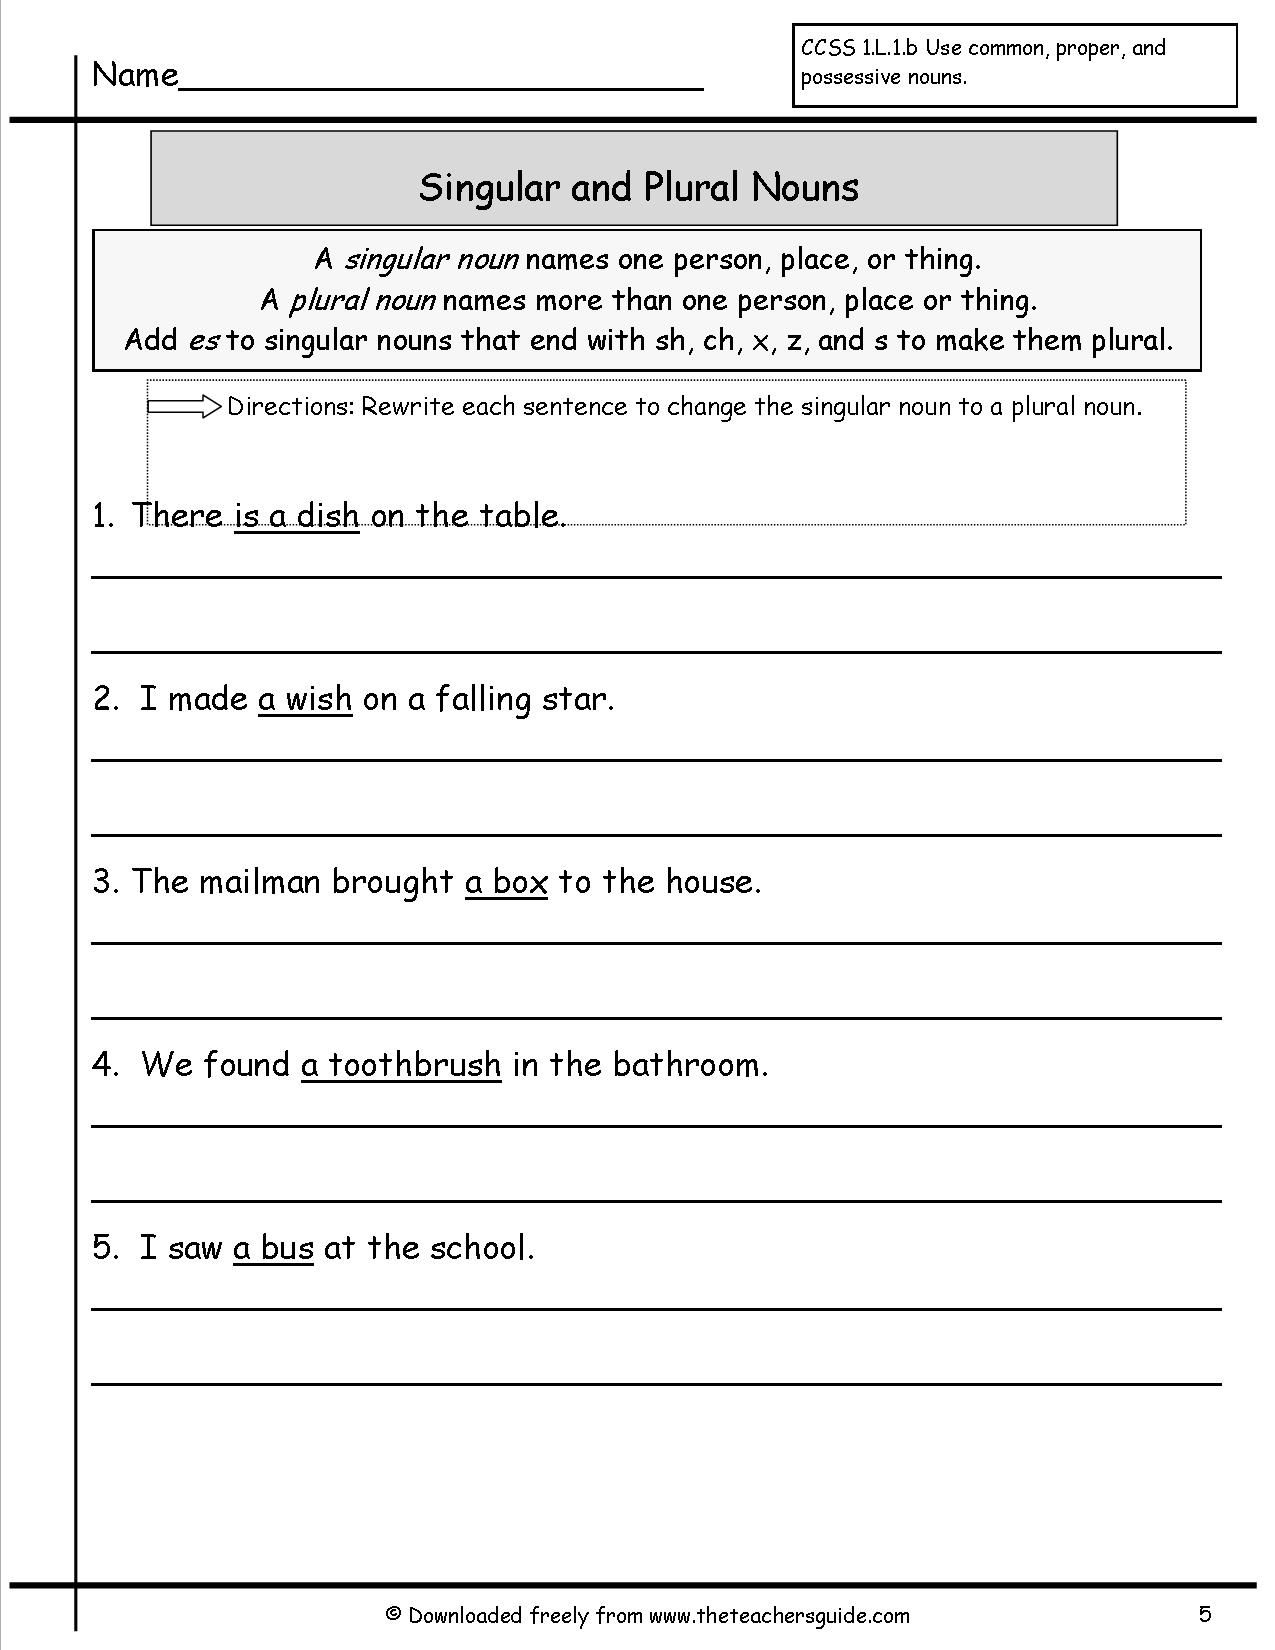 Nouns Worksheets | Singular and Plural Nouns Worksheets